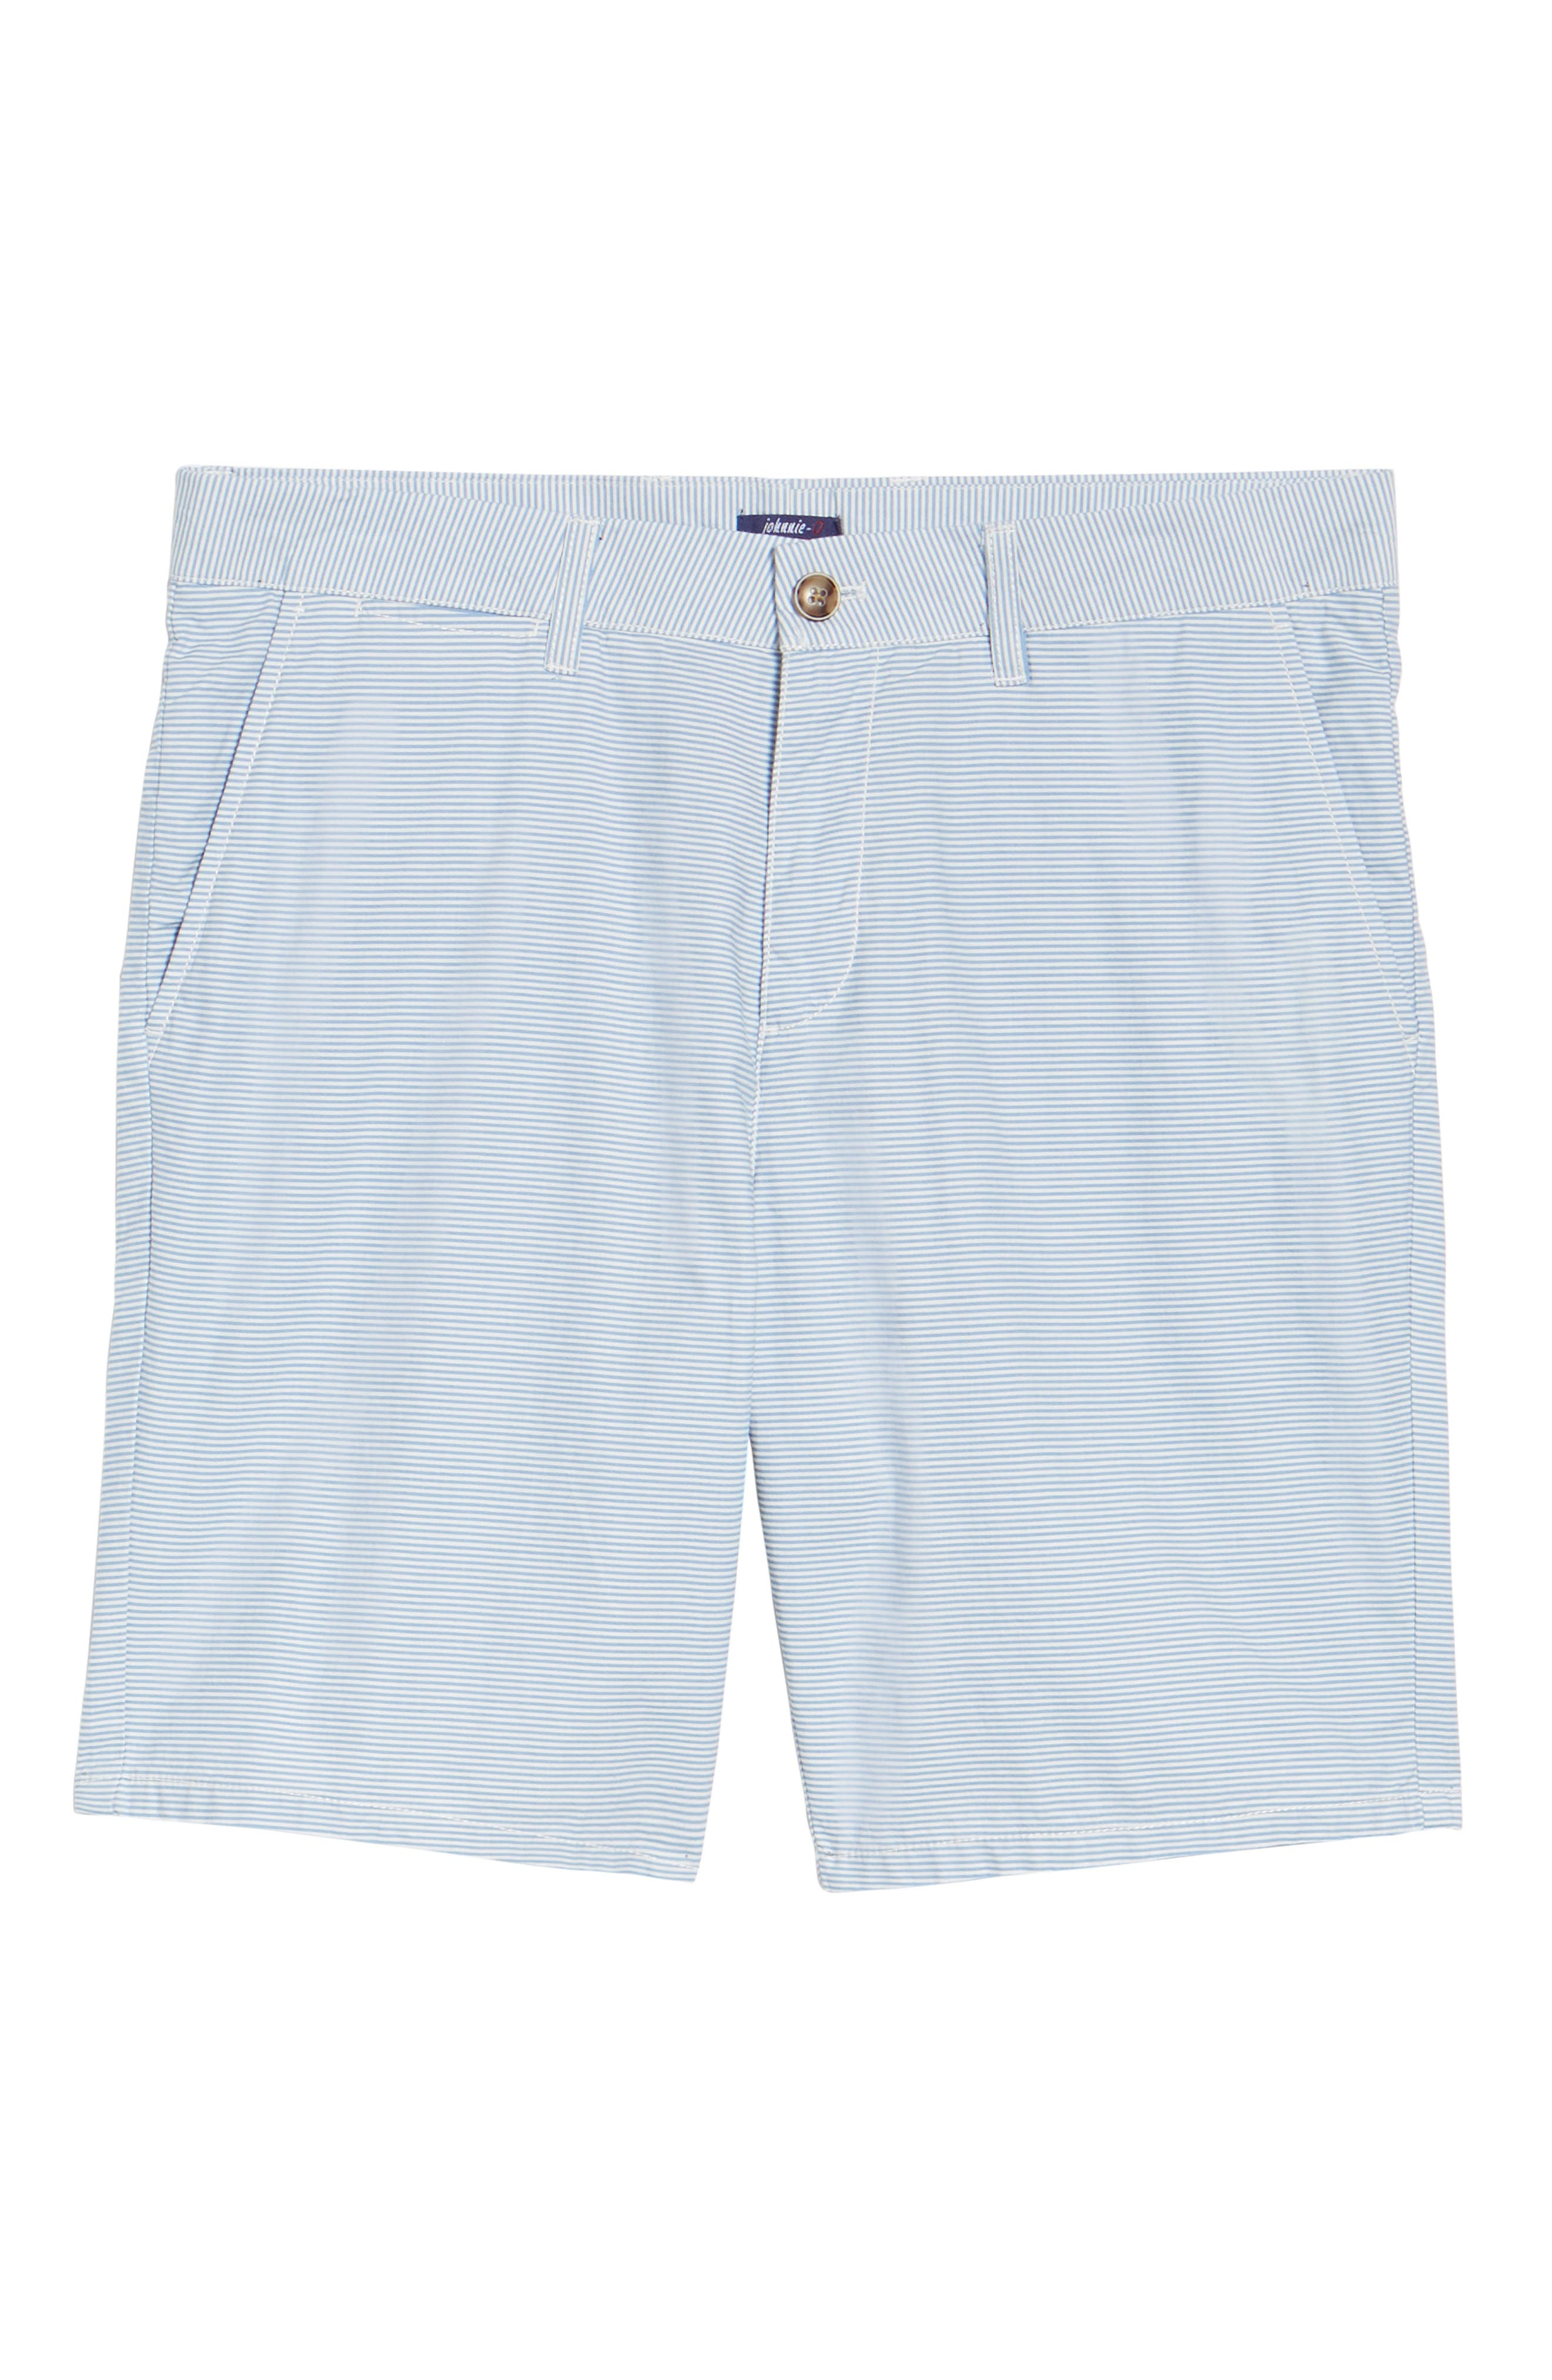 Geordy Regular Fit Pinstripe Shorts,                             Alternate thumbnail 6, color,                             400